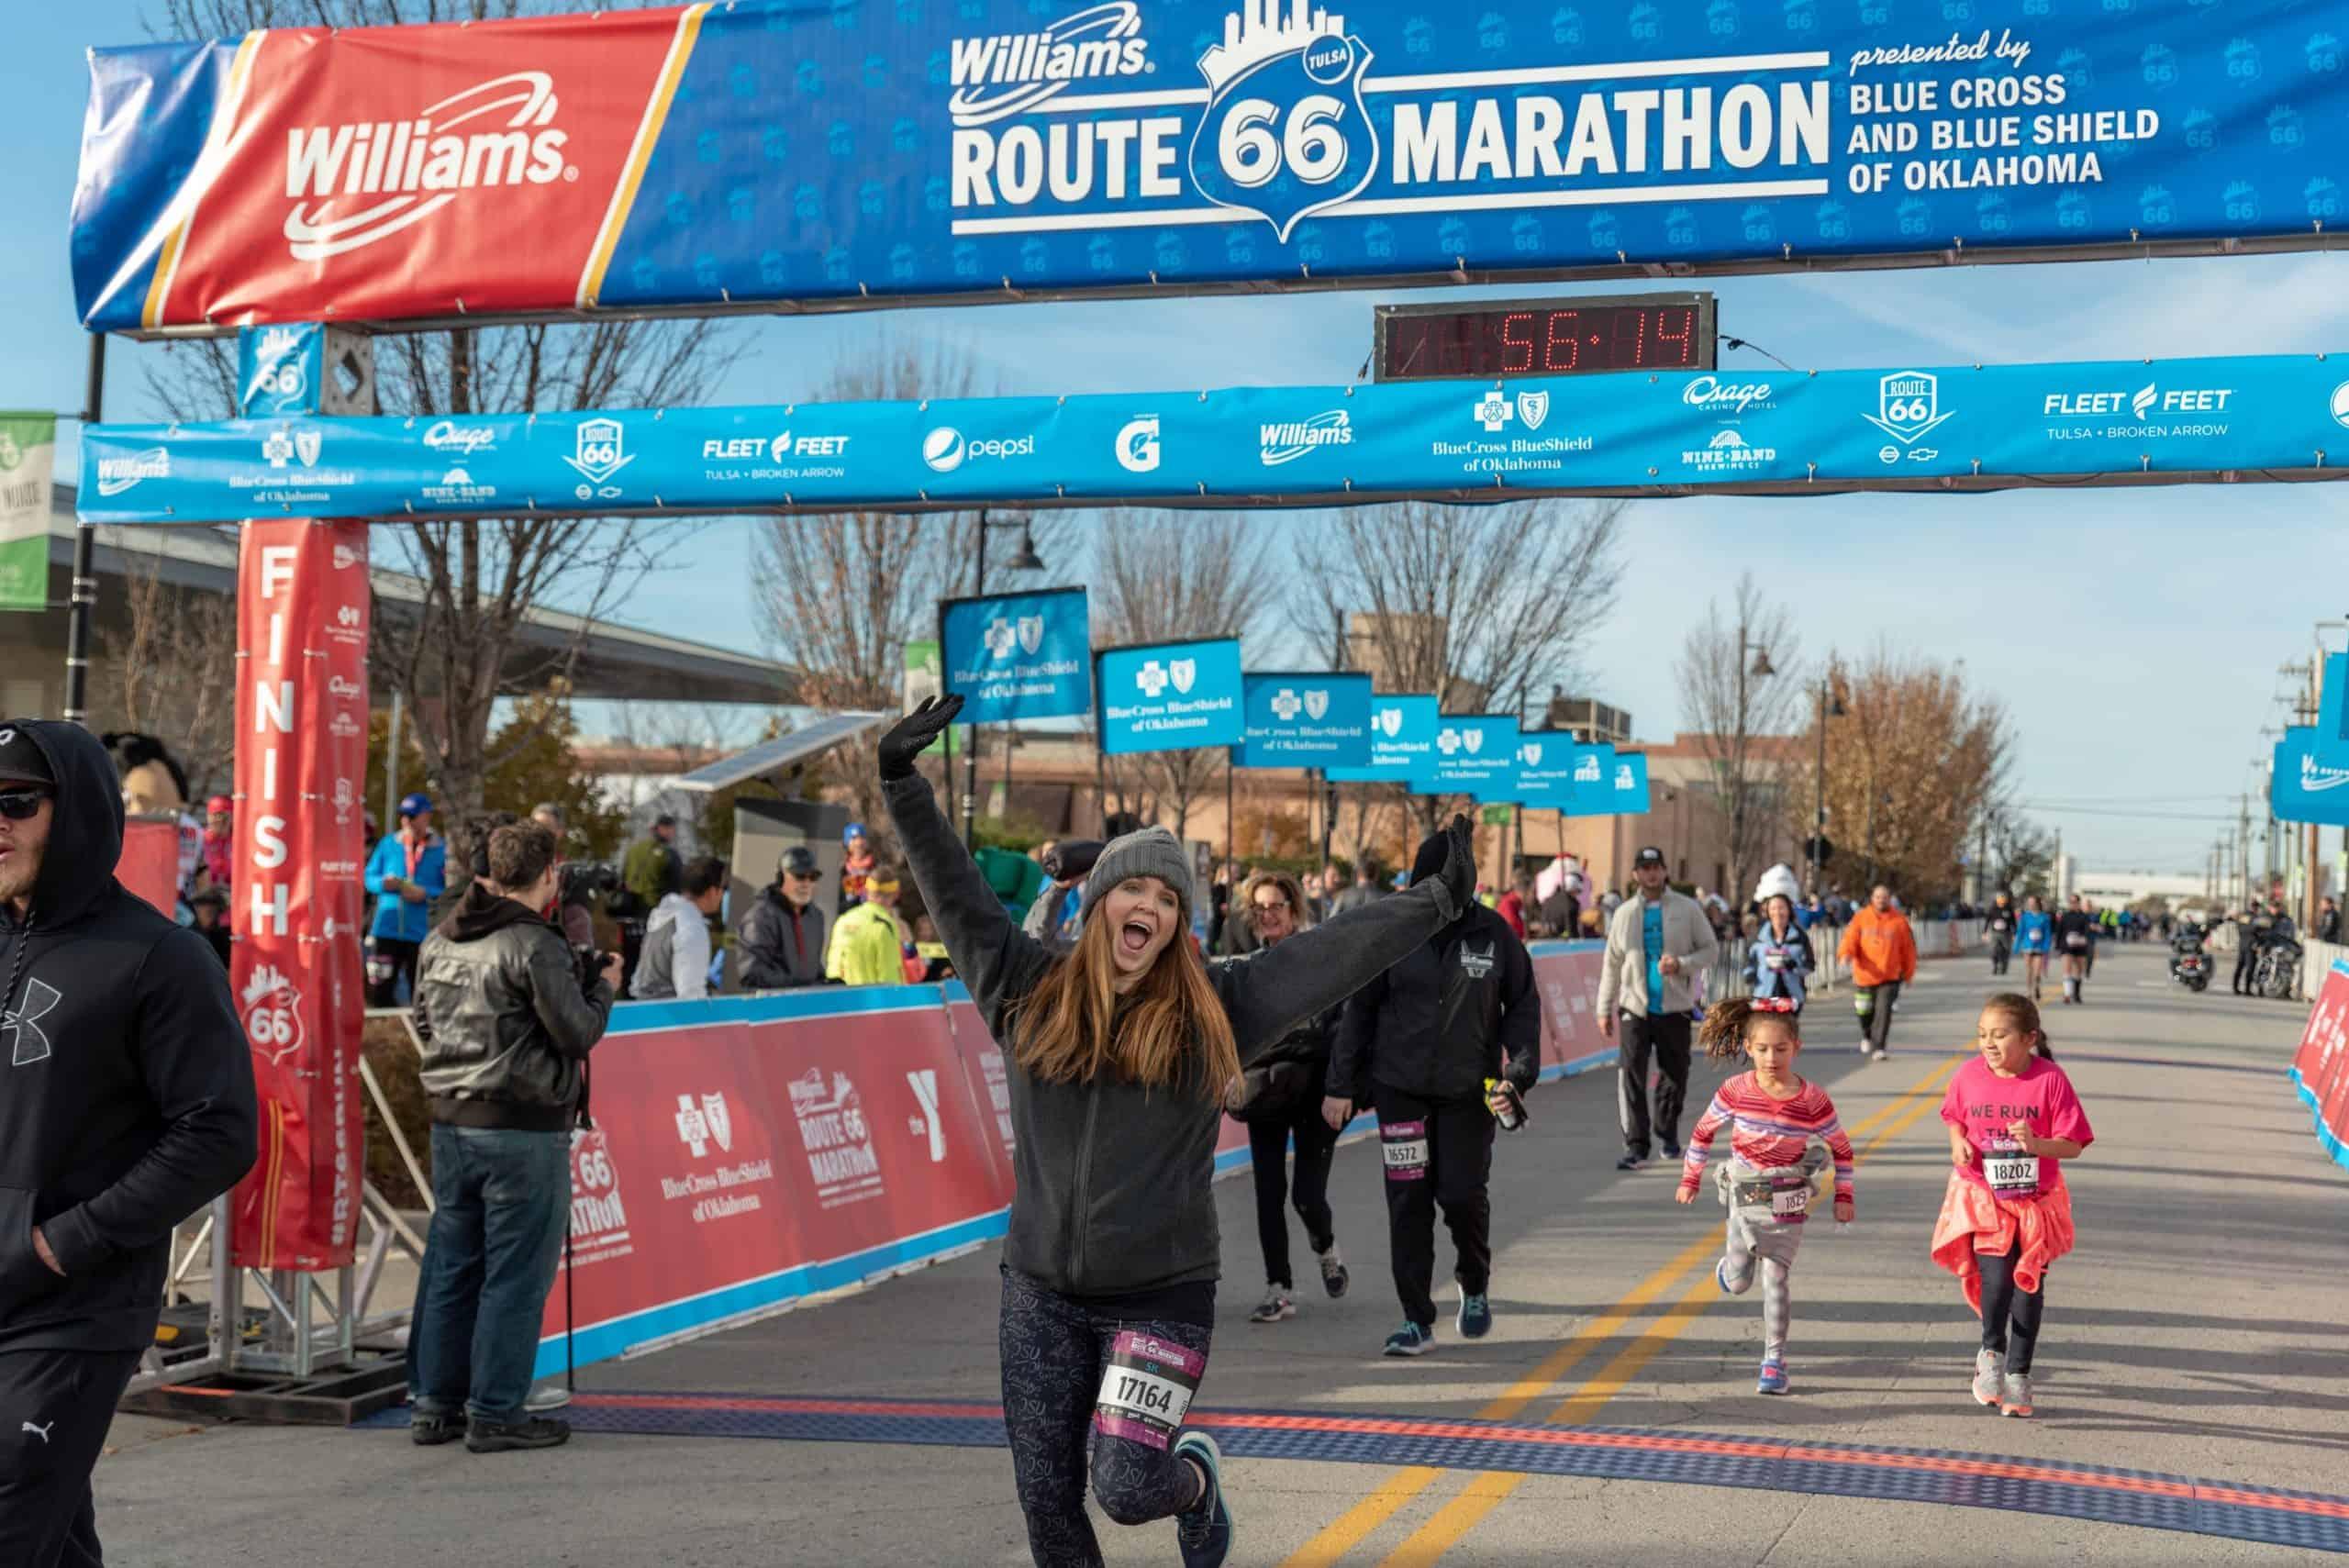 Route 66 Marathon 5k Finisher